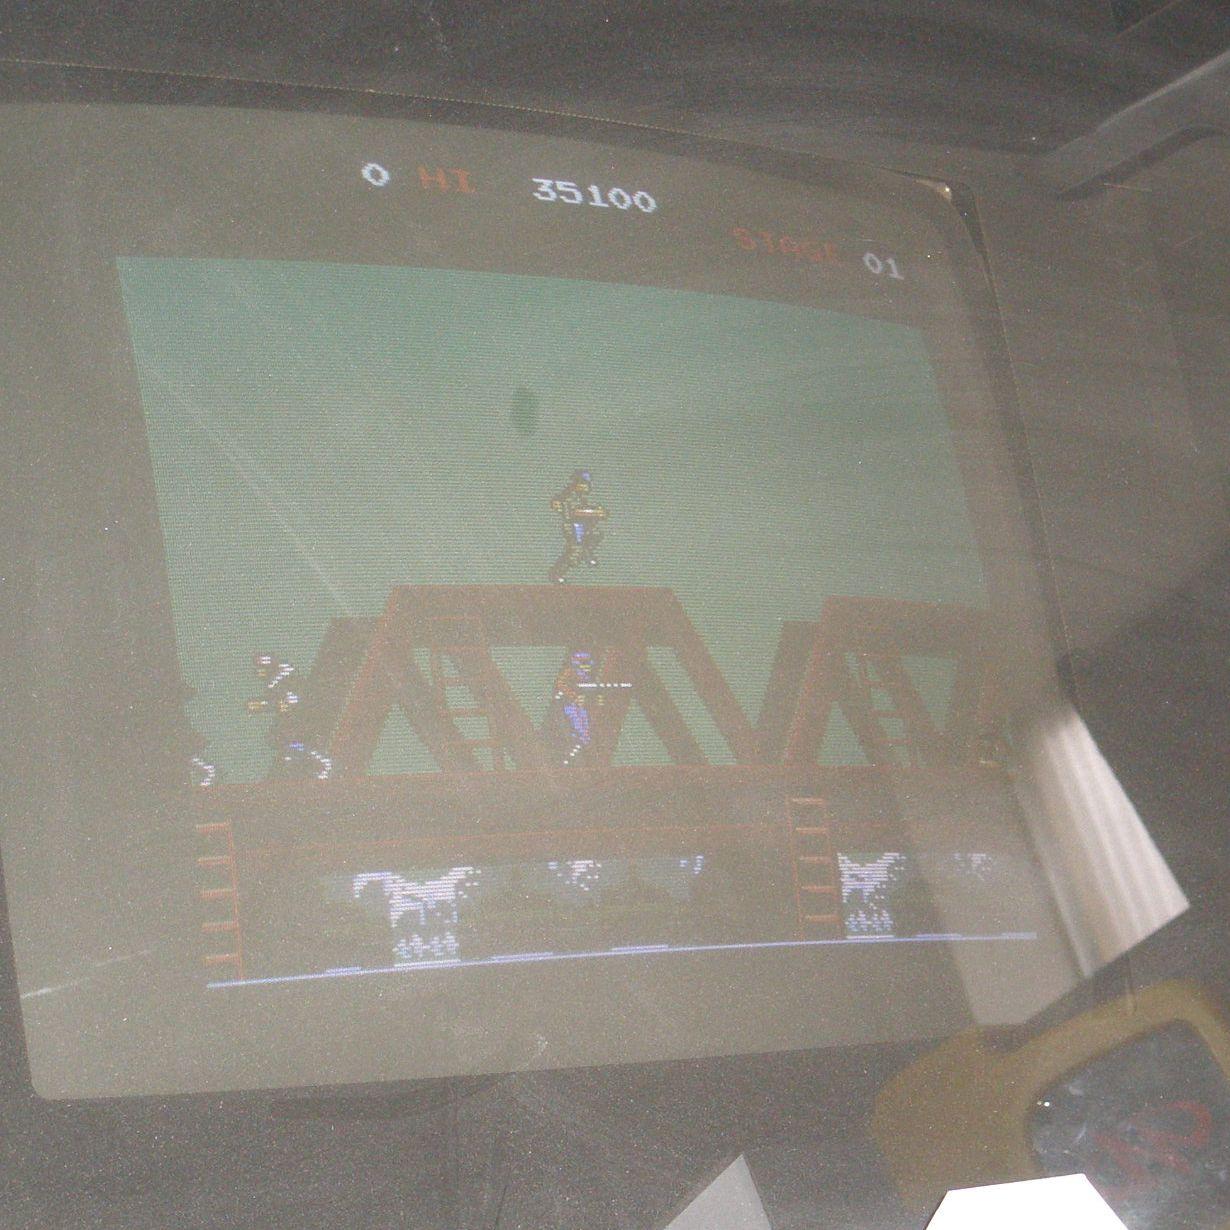 http://arcadius.esero.net/Arcade/Games/Non_Jamma_Fully_Working/Green_Beret_04.jpg